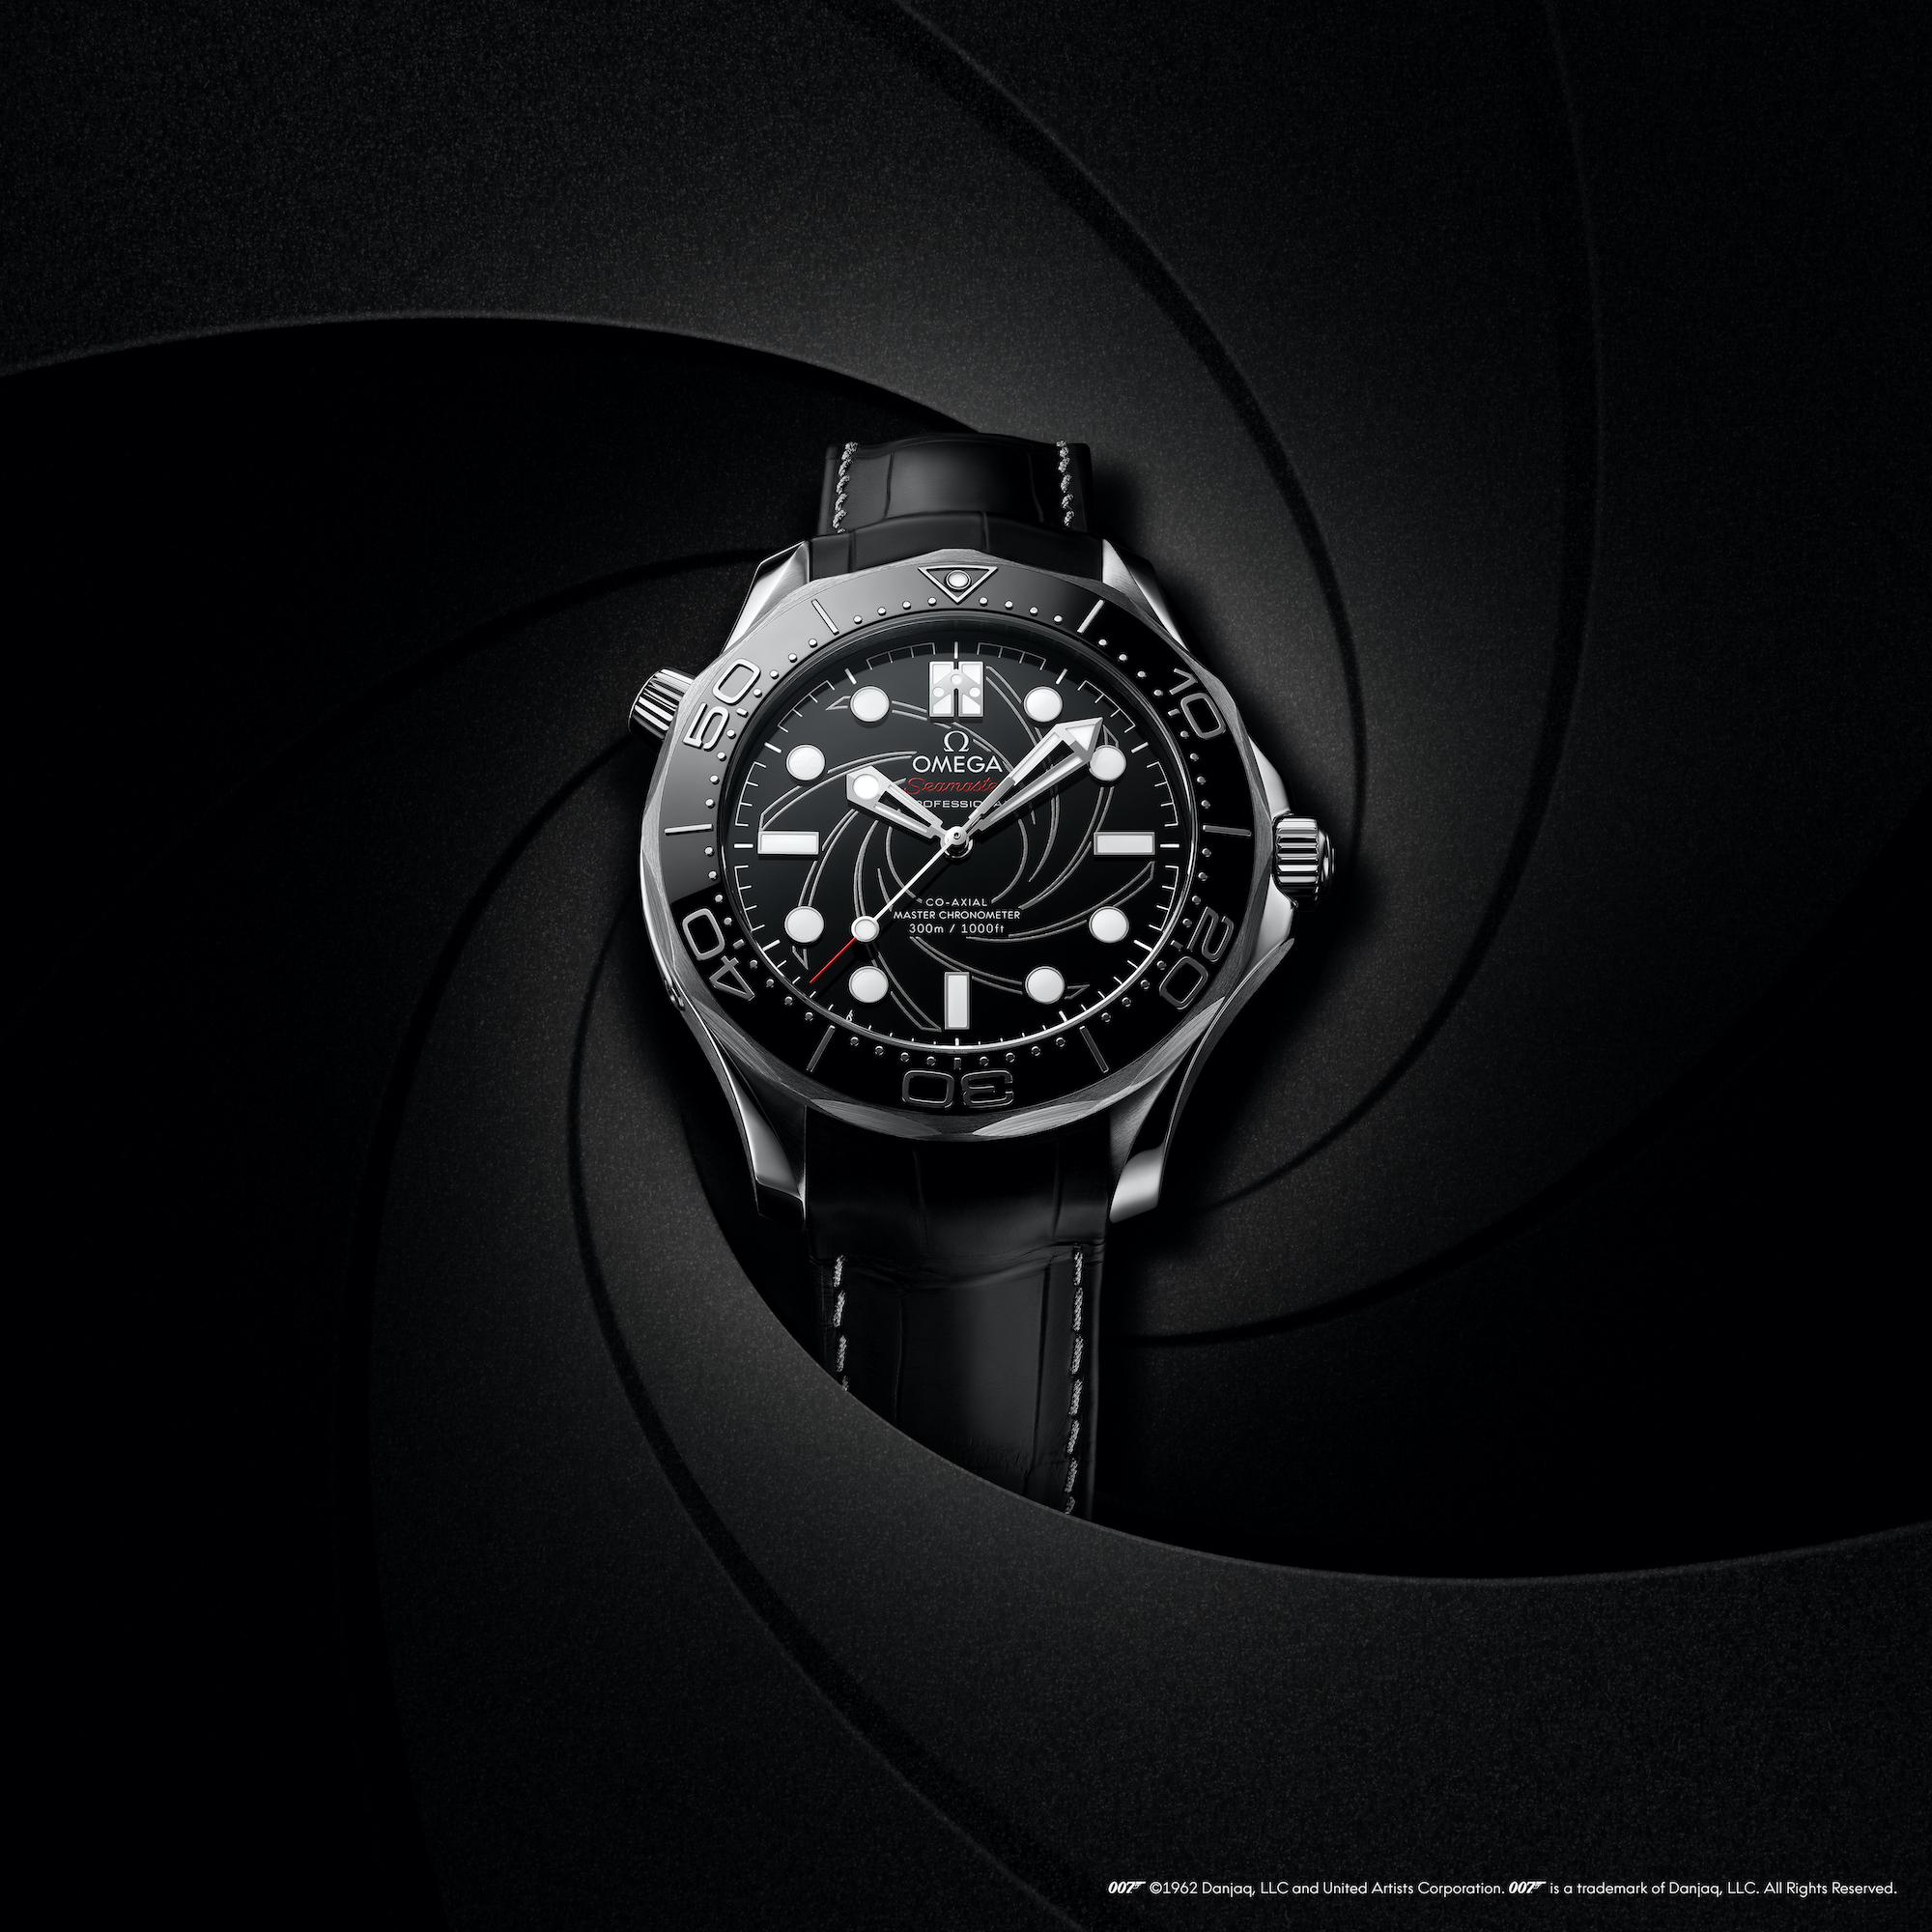 Omega Seamaster Diver 300M James Bond Platino Oro 210.93.42.20.01.001 lifestyle